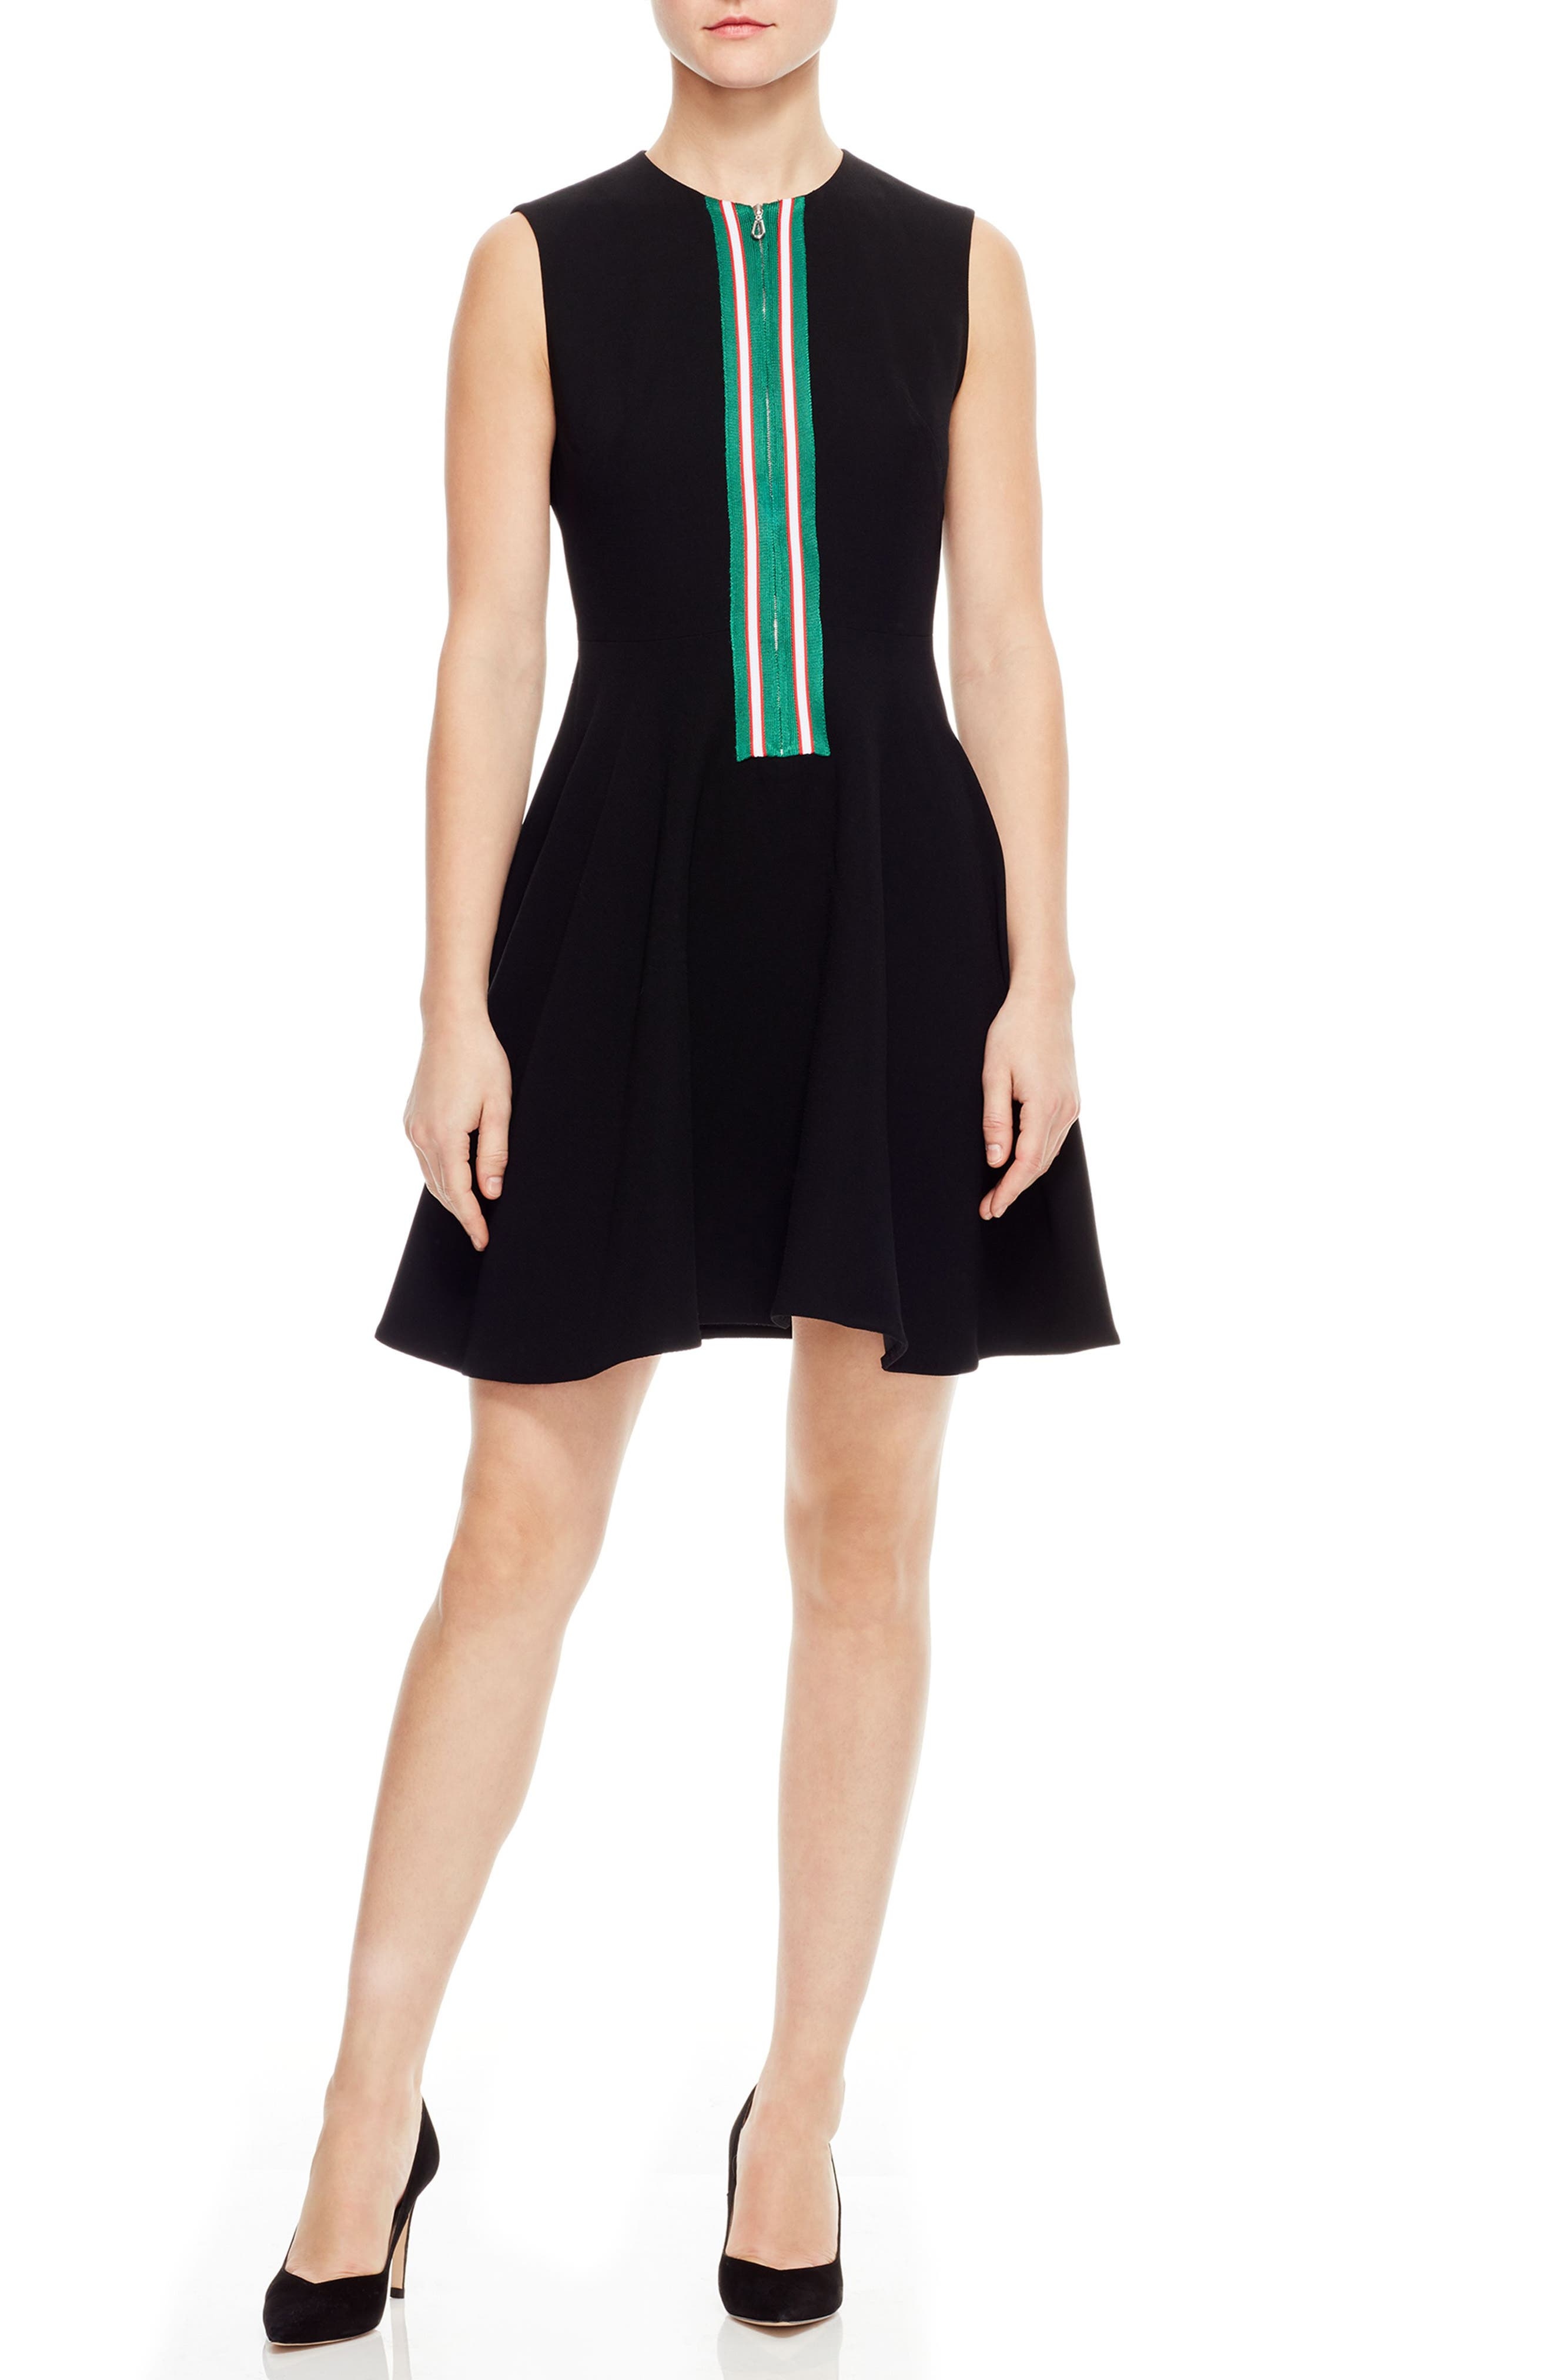 Ines Stripe Zip Detail Skater Dress in Black